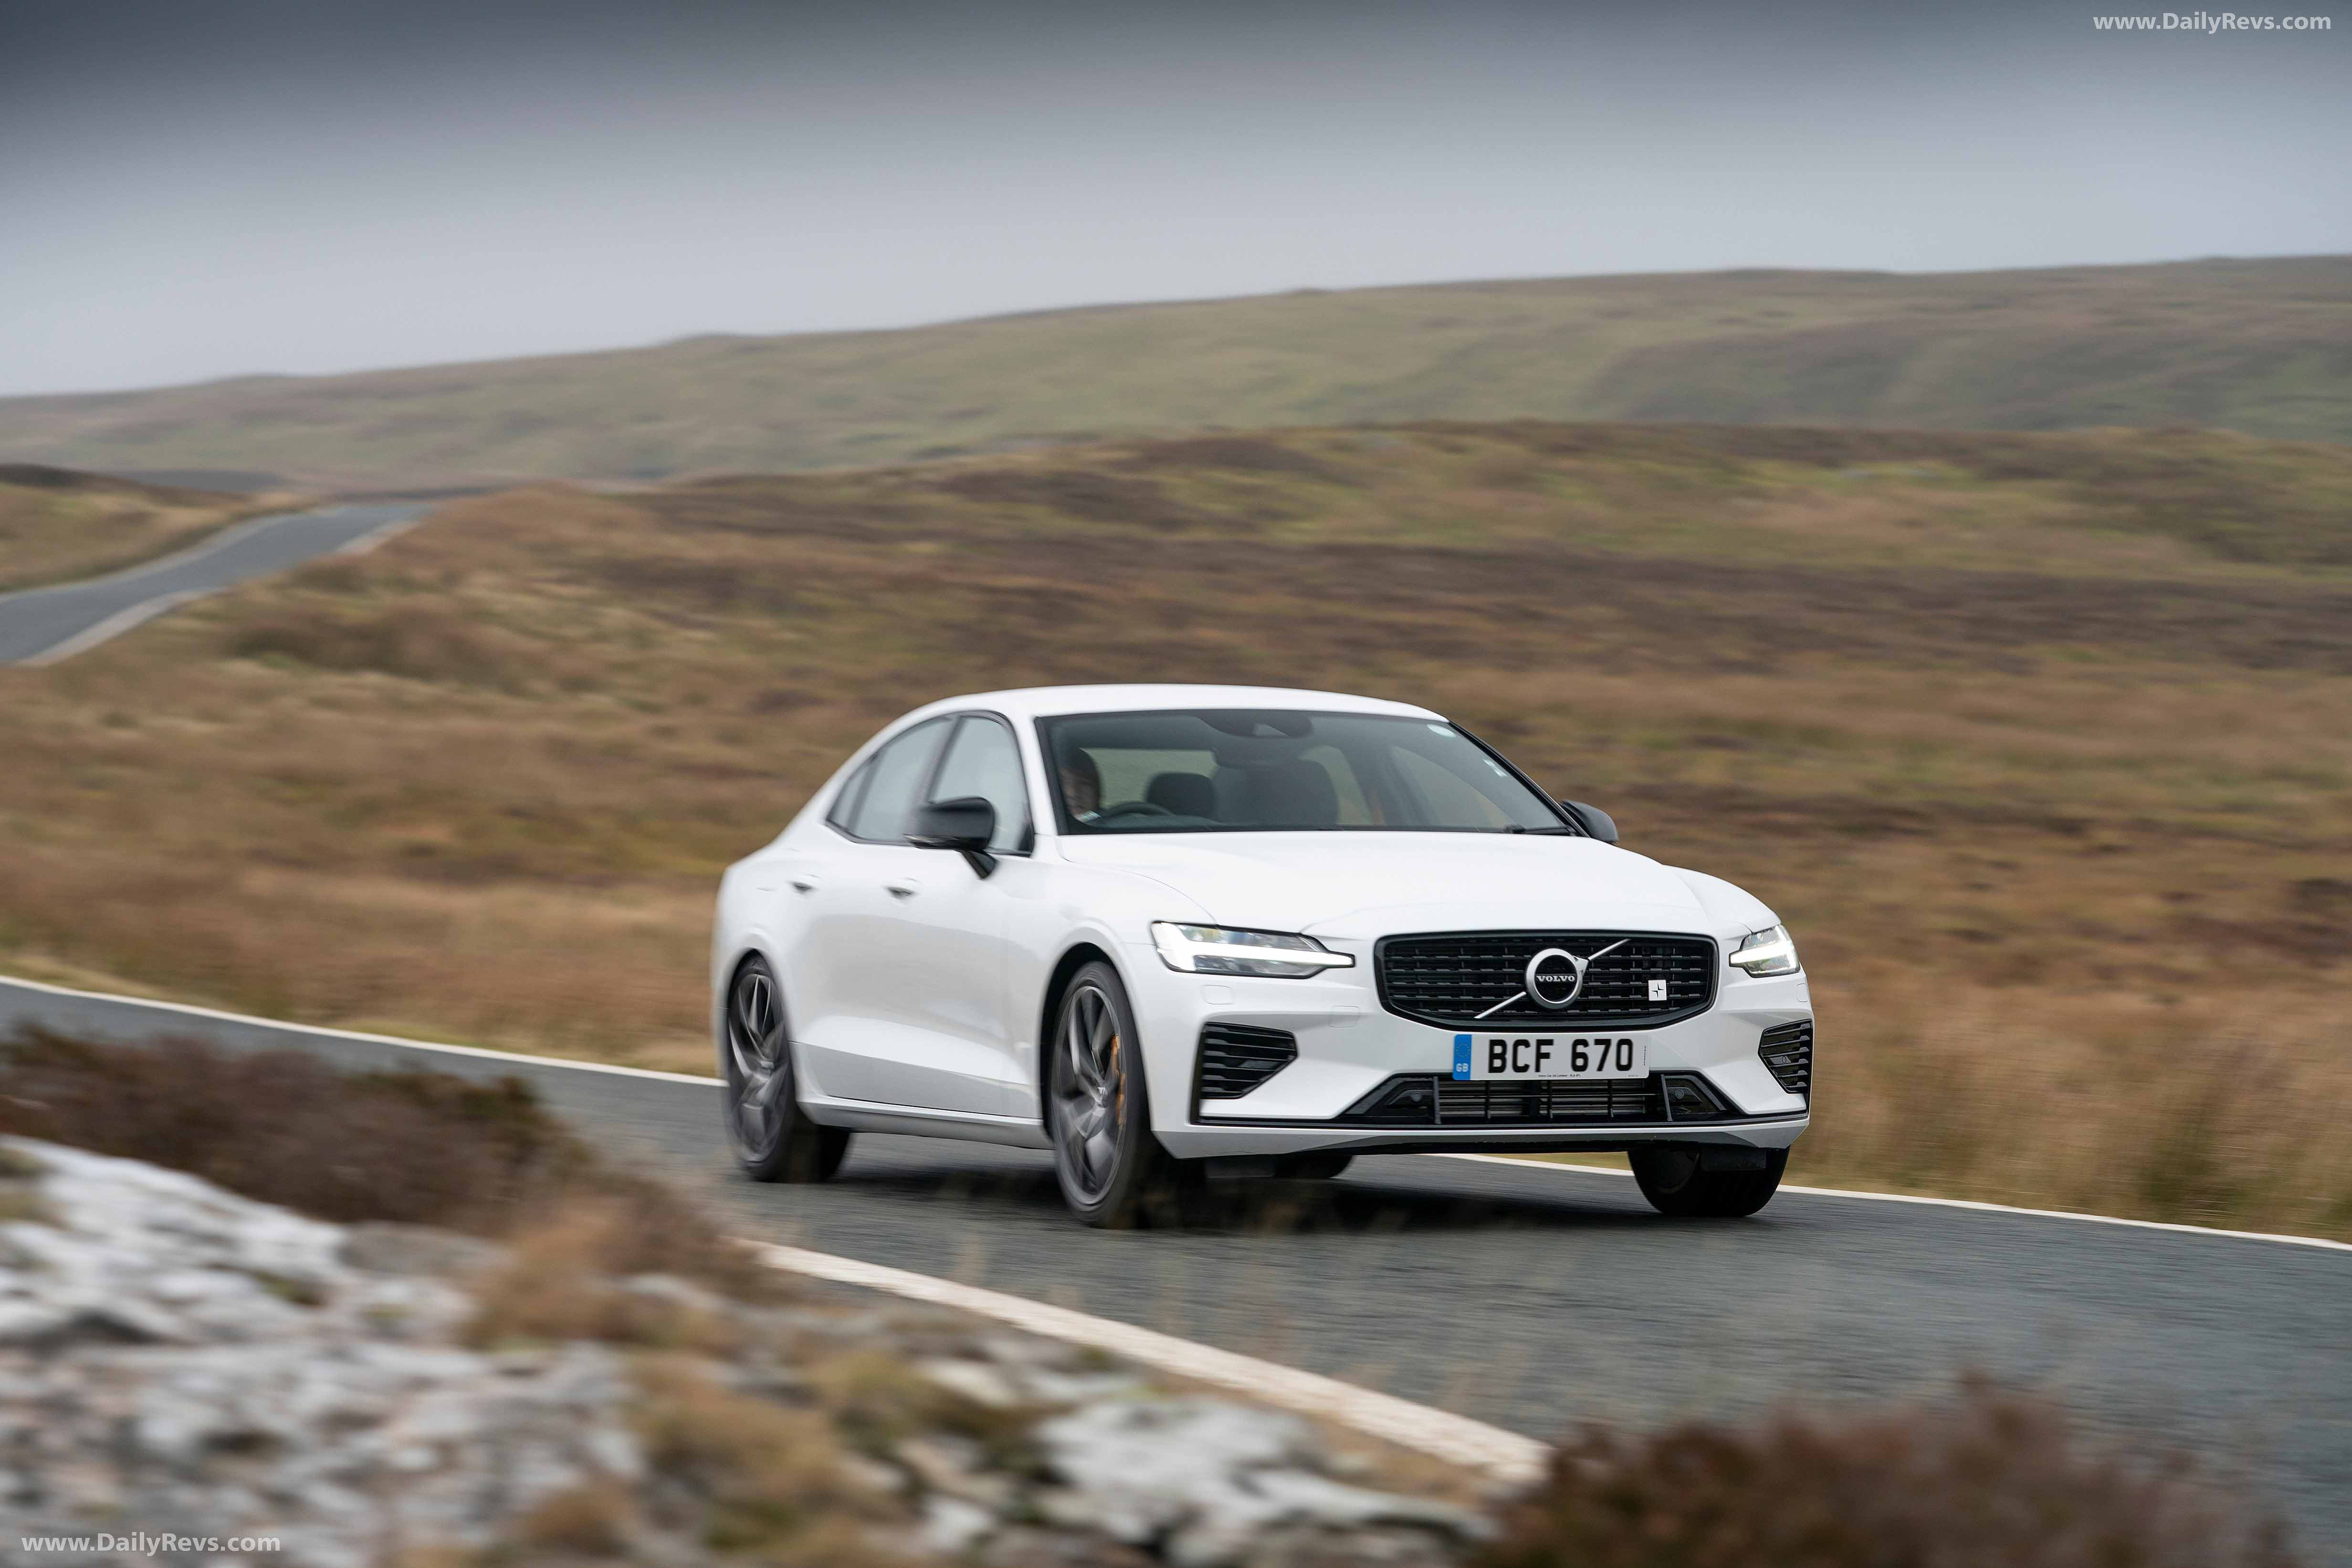 2019 Volvo S60 T8 Twin Engine Polestar Engineered - HD ...